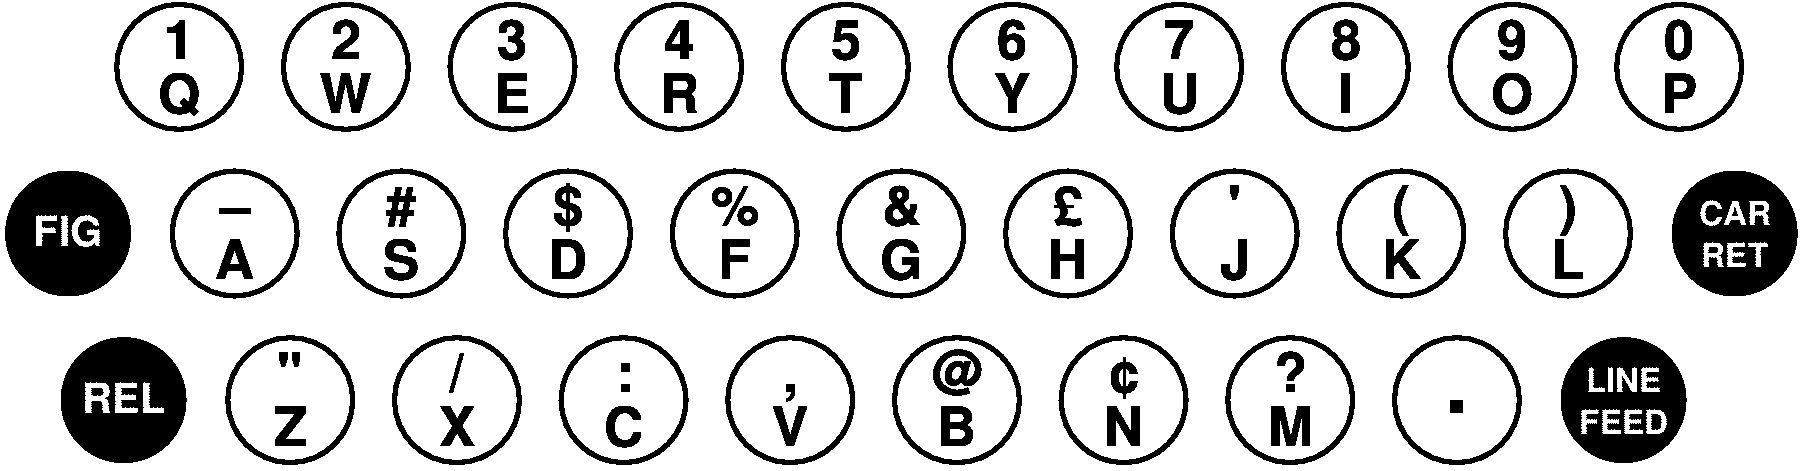 「The Morkrum Printing Telegraph」のキー配列